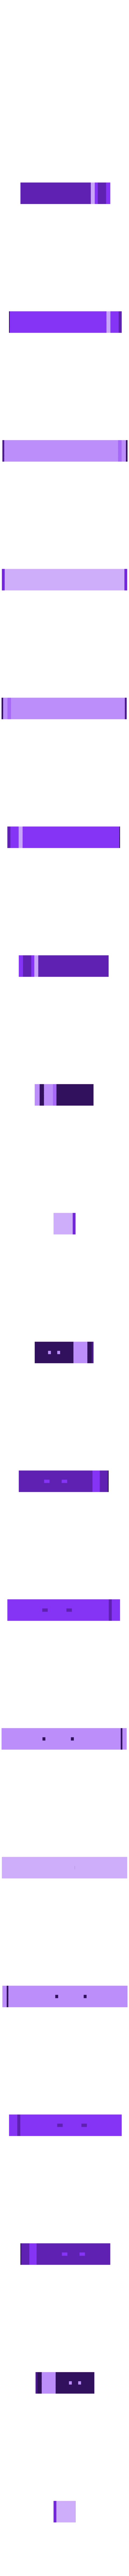 G traverse AR.STL Download STL file Draisine Matisa for LGB • 3D printable object, biddle